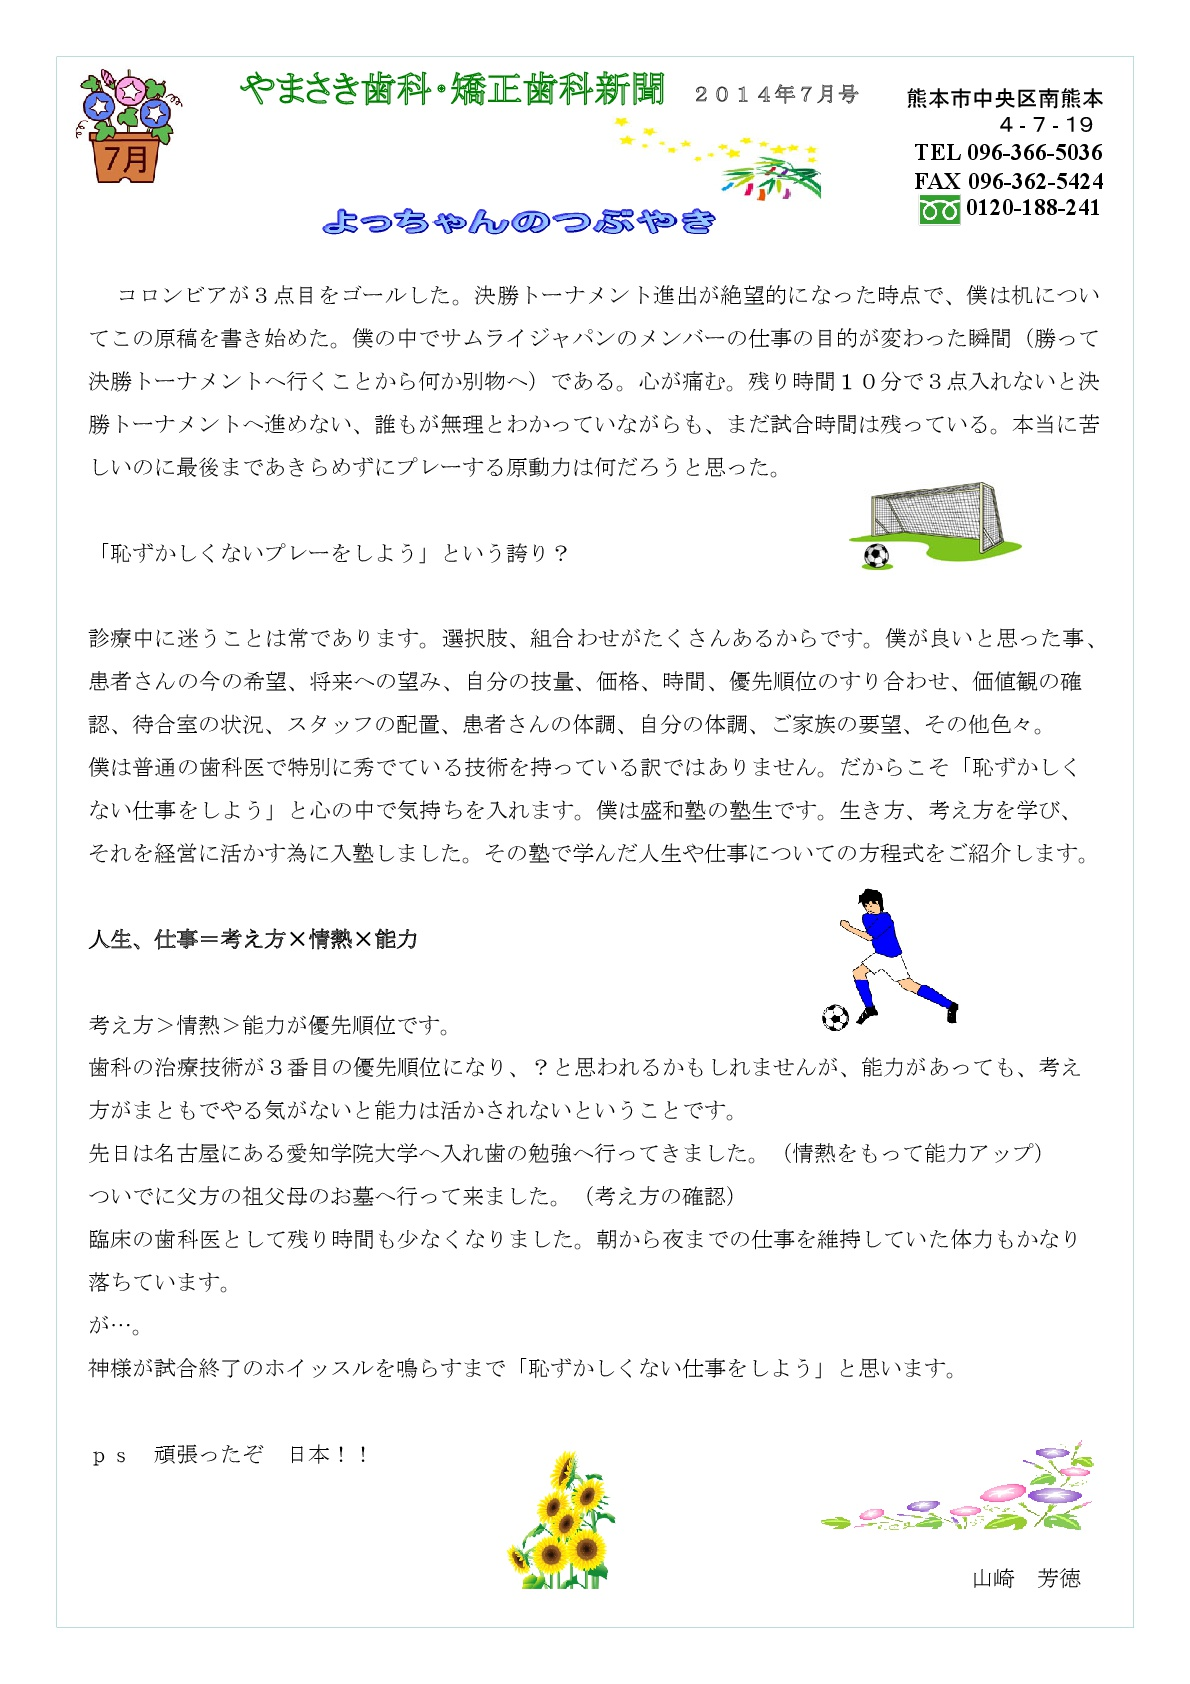 sinbun14-7-1-001